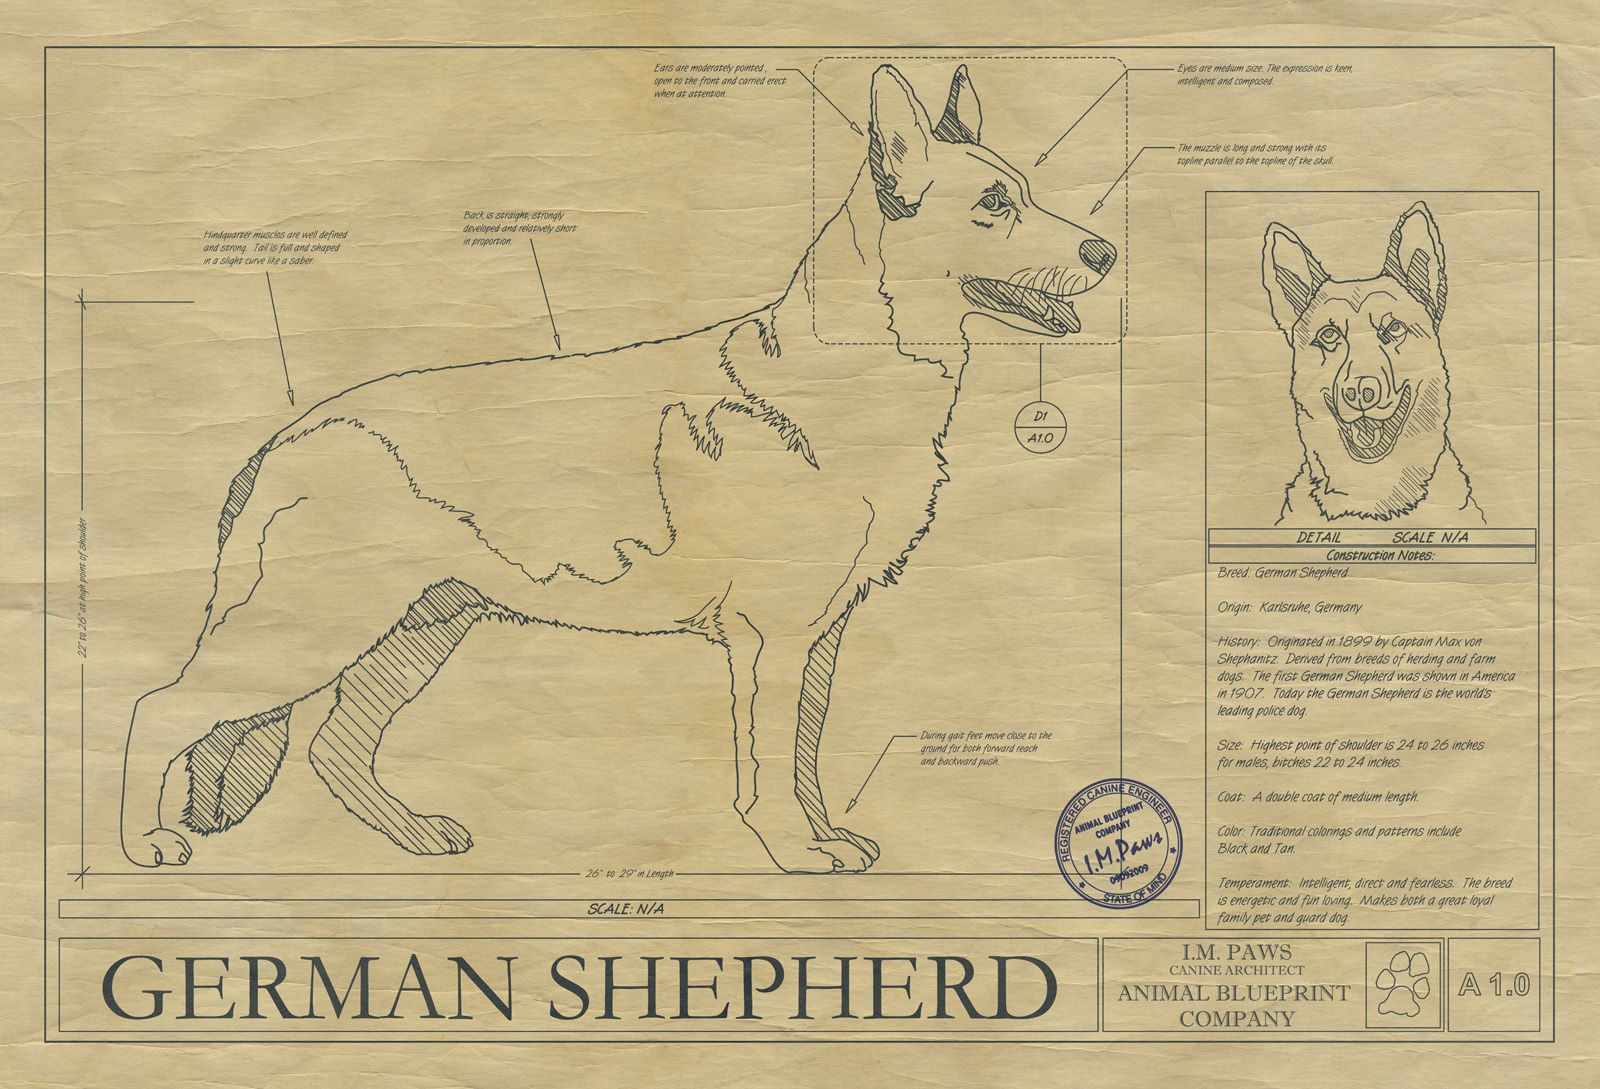 GERMAN SHEPHERD DRAWING   Holiday Gifts   Pinterest   German ...